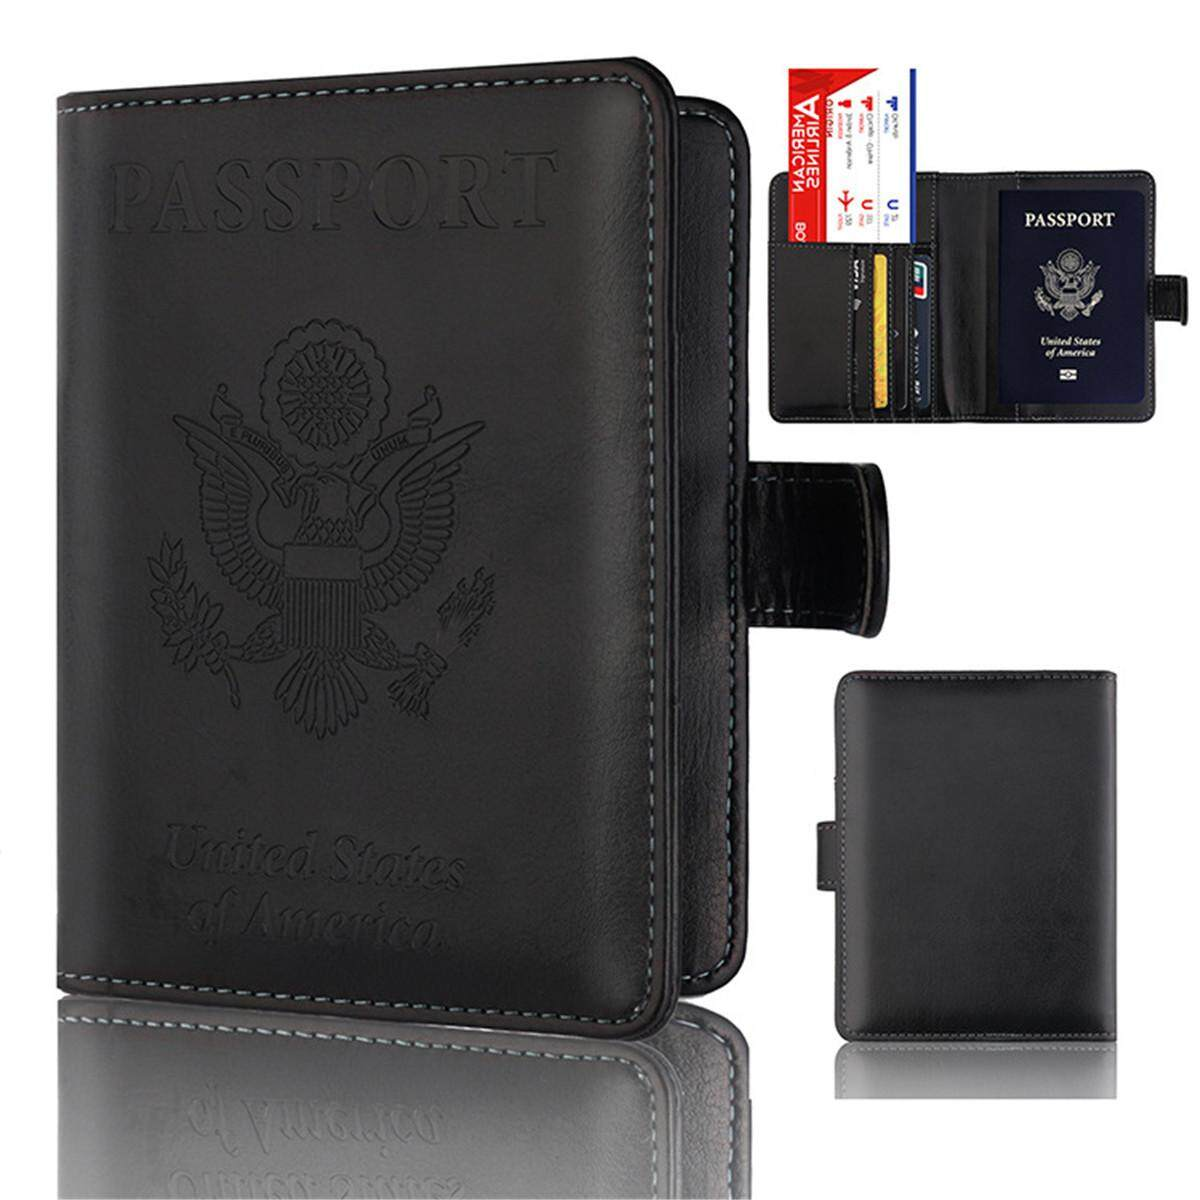 Voucher Khuyến Mại Passport Holder Wallet Cover Case RFID Blocking Travel Wallet Rose Gold #black